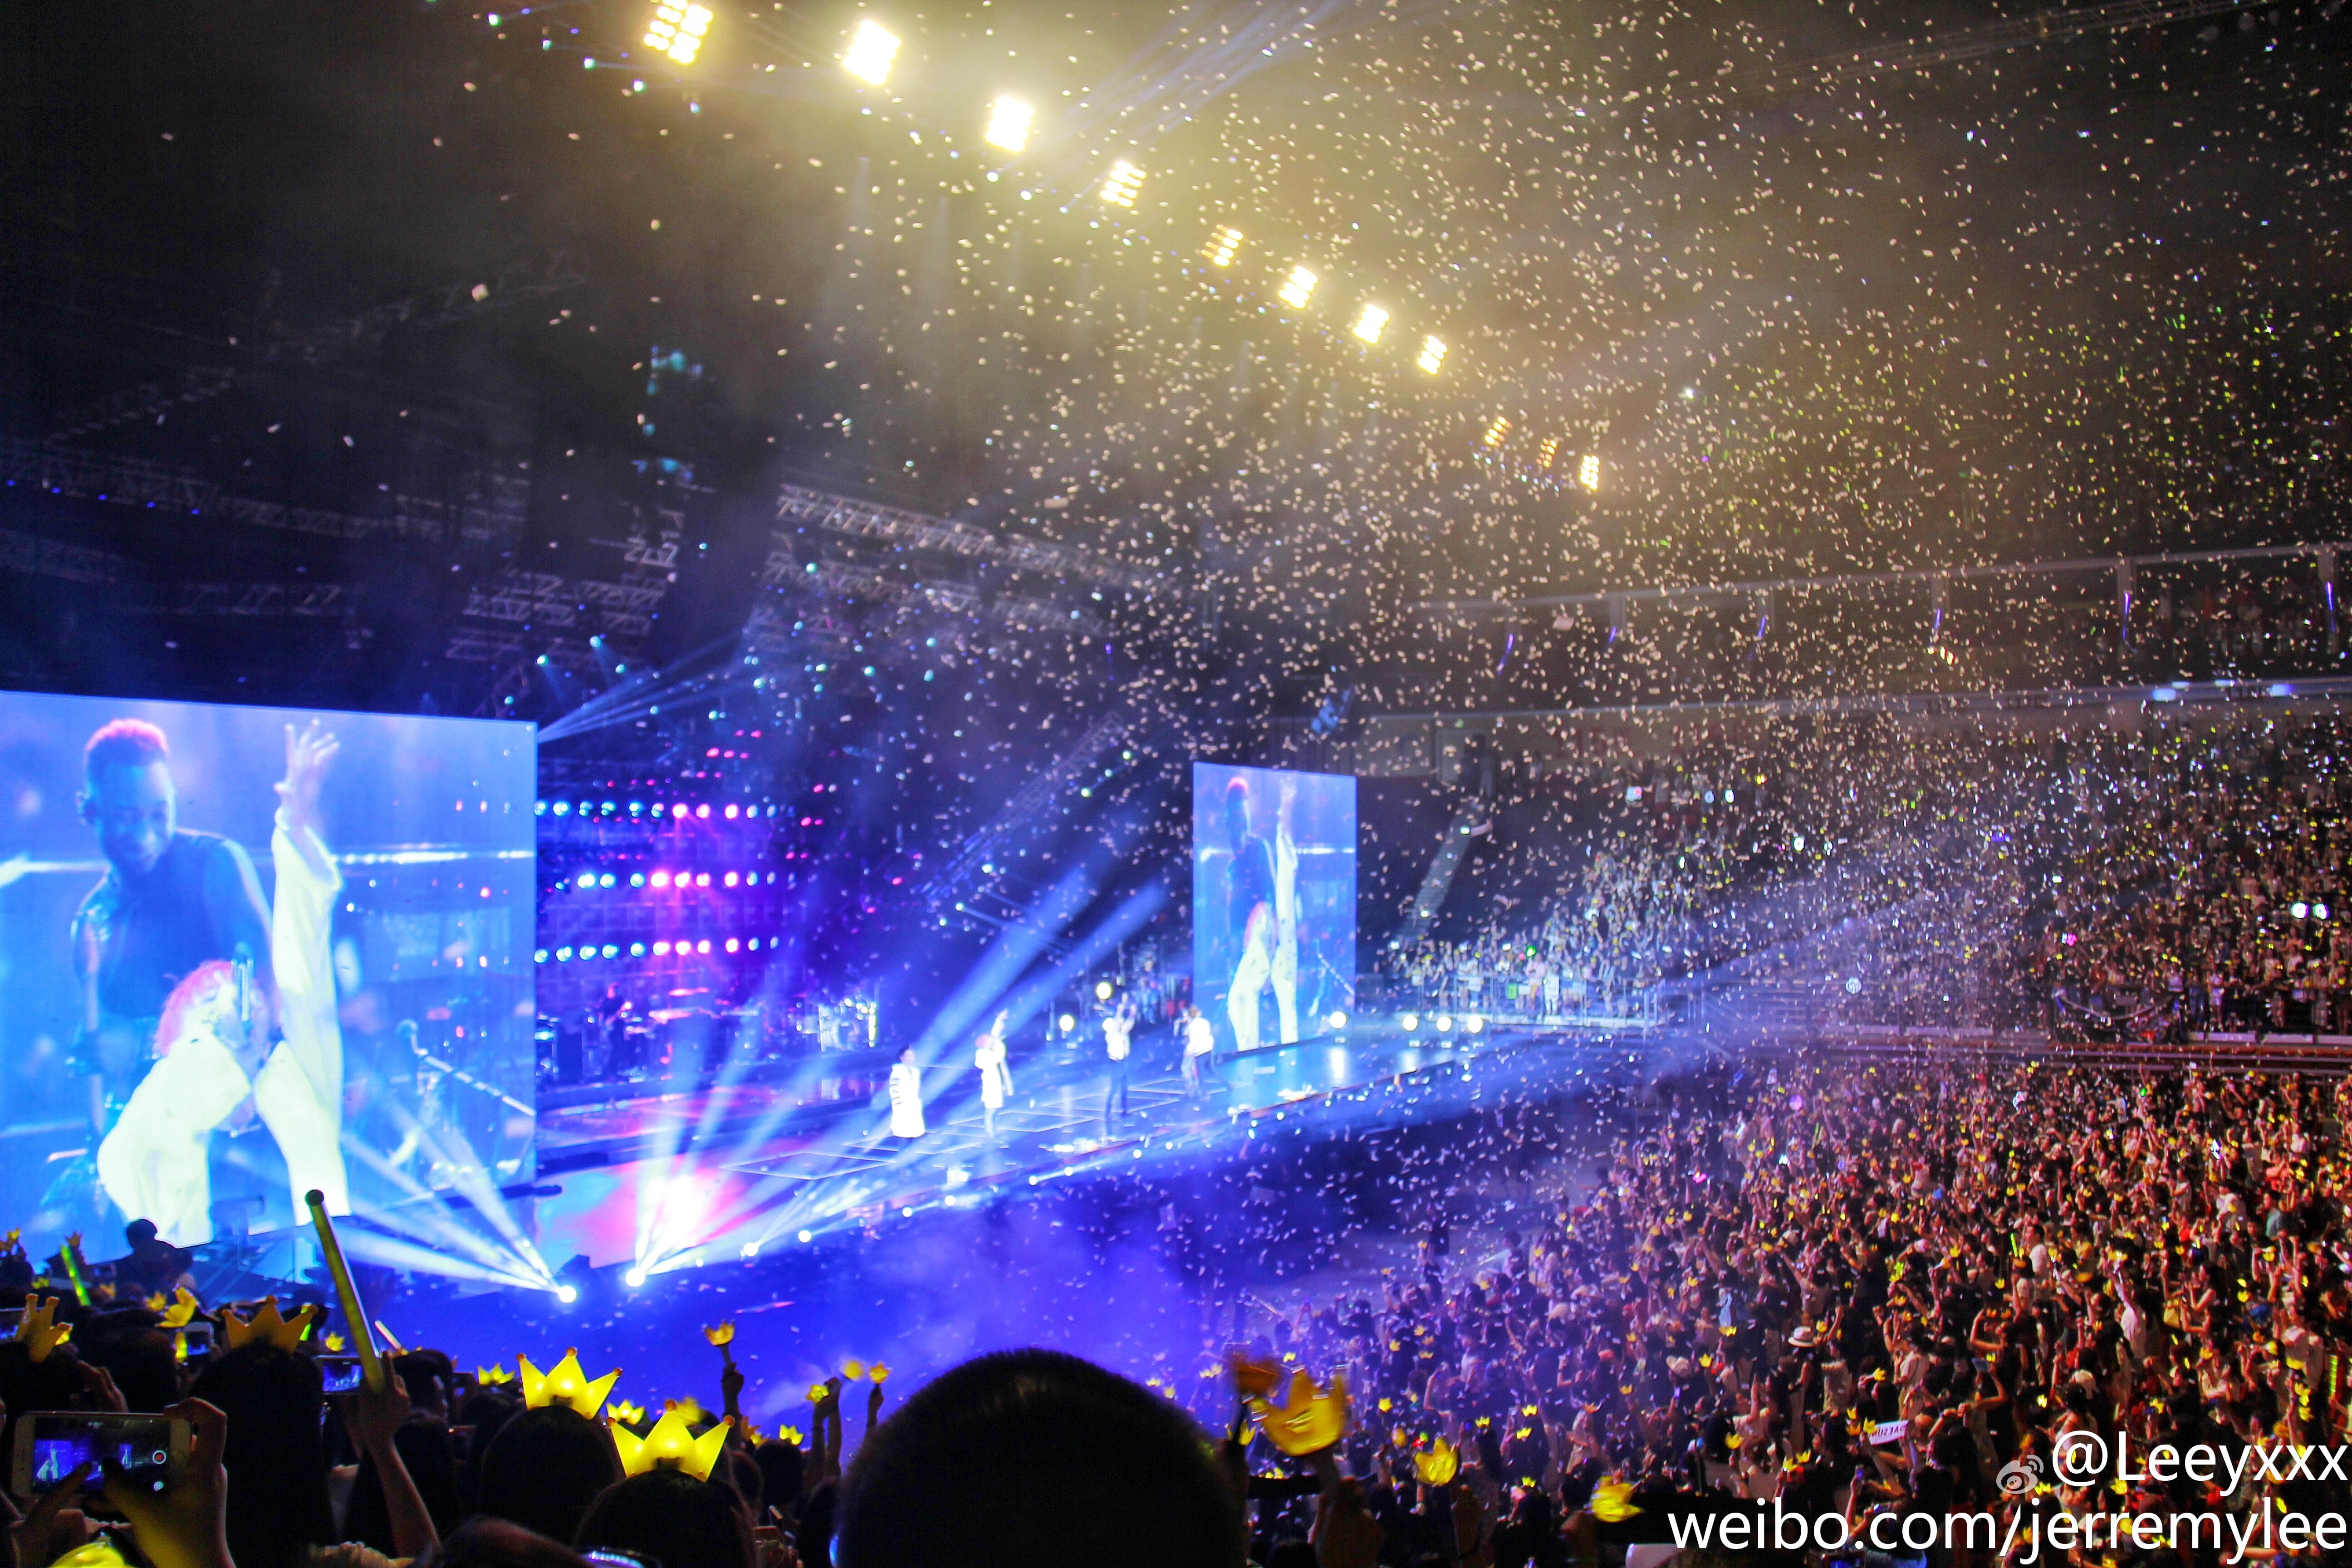 BIGBANG - Made Tour 2015 - Guangzhou - 30may2015 - jerremylee - 06.jpg